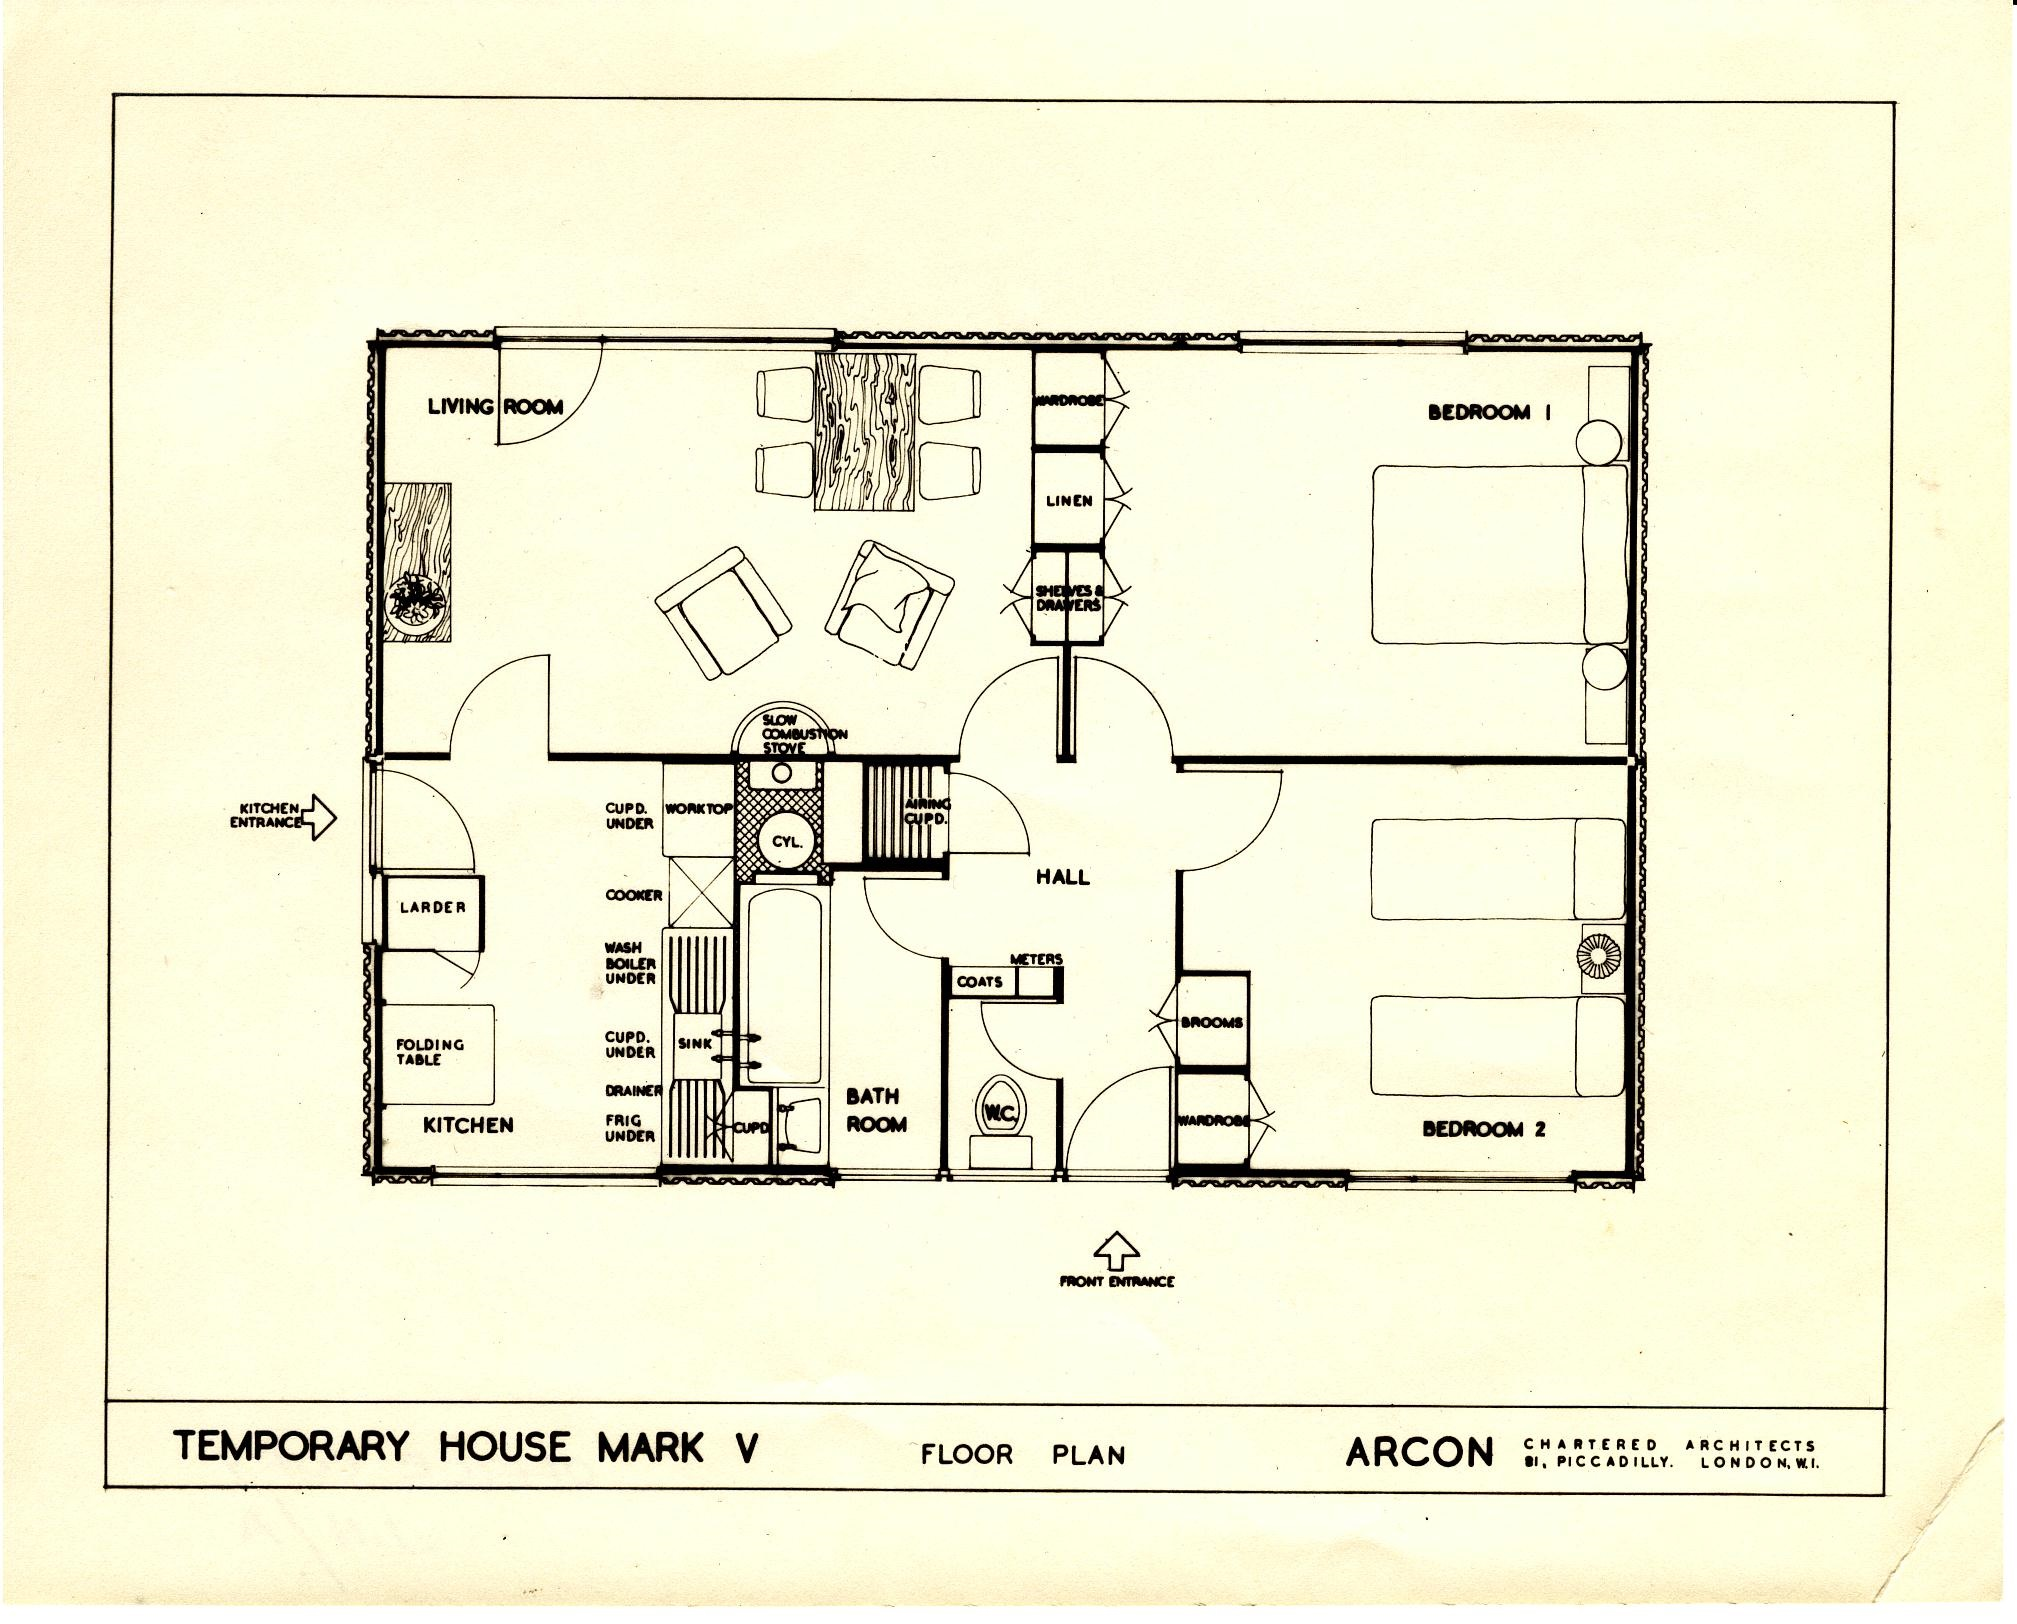 design the prefab museum floor plan of the arcon mkv